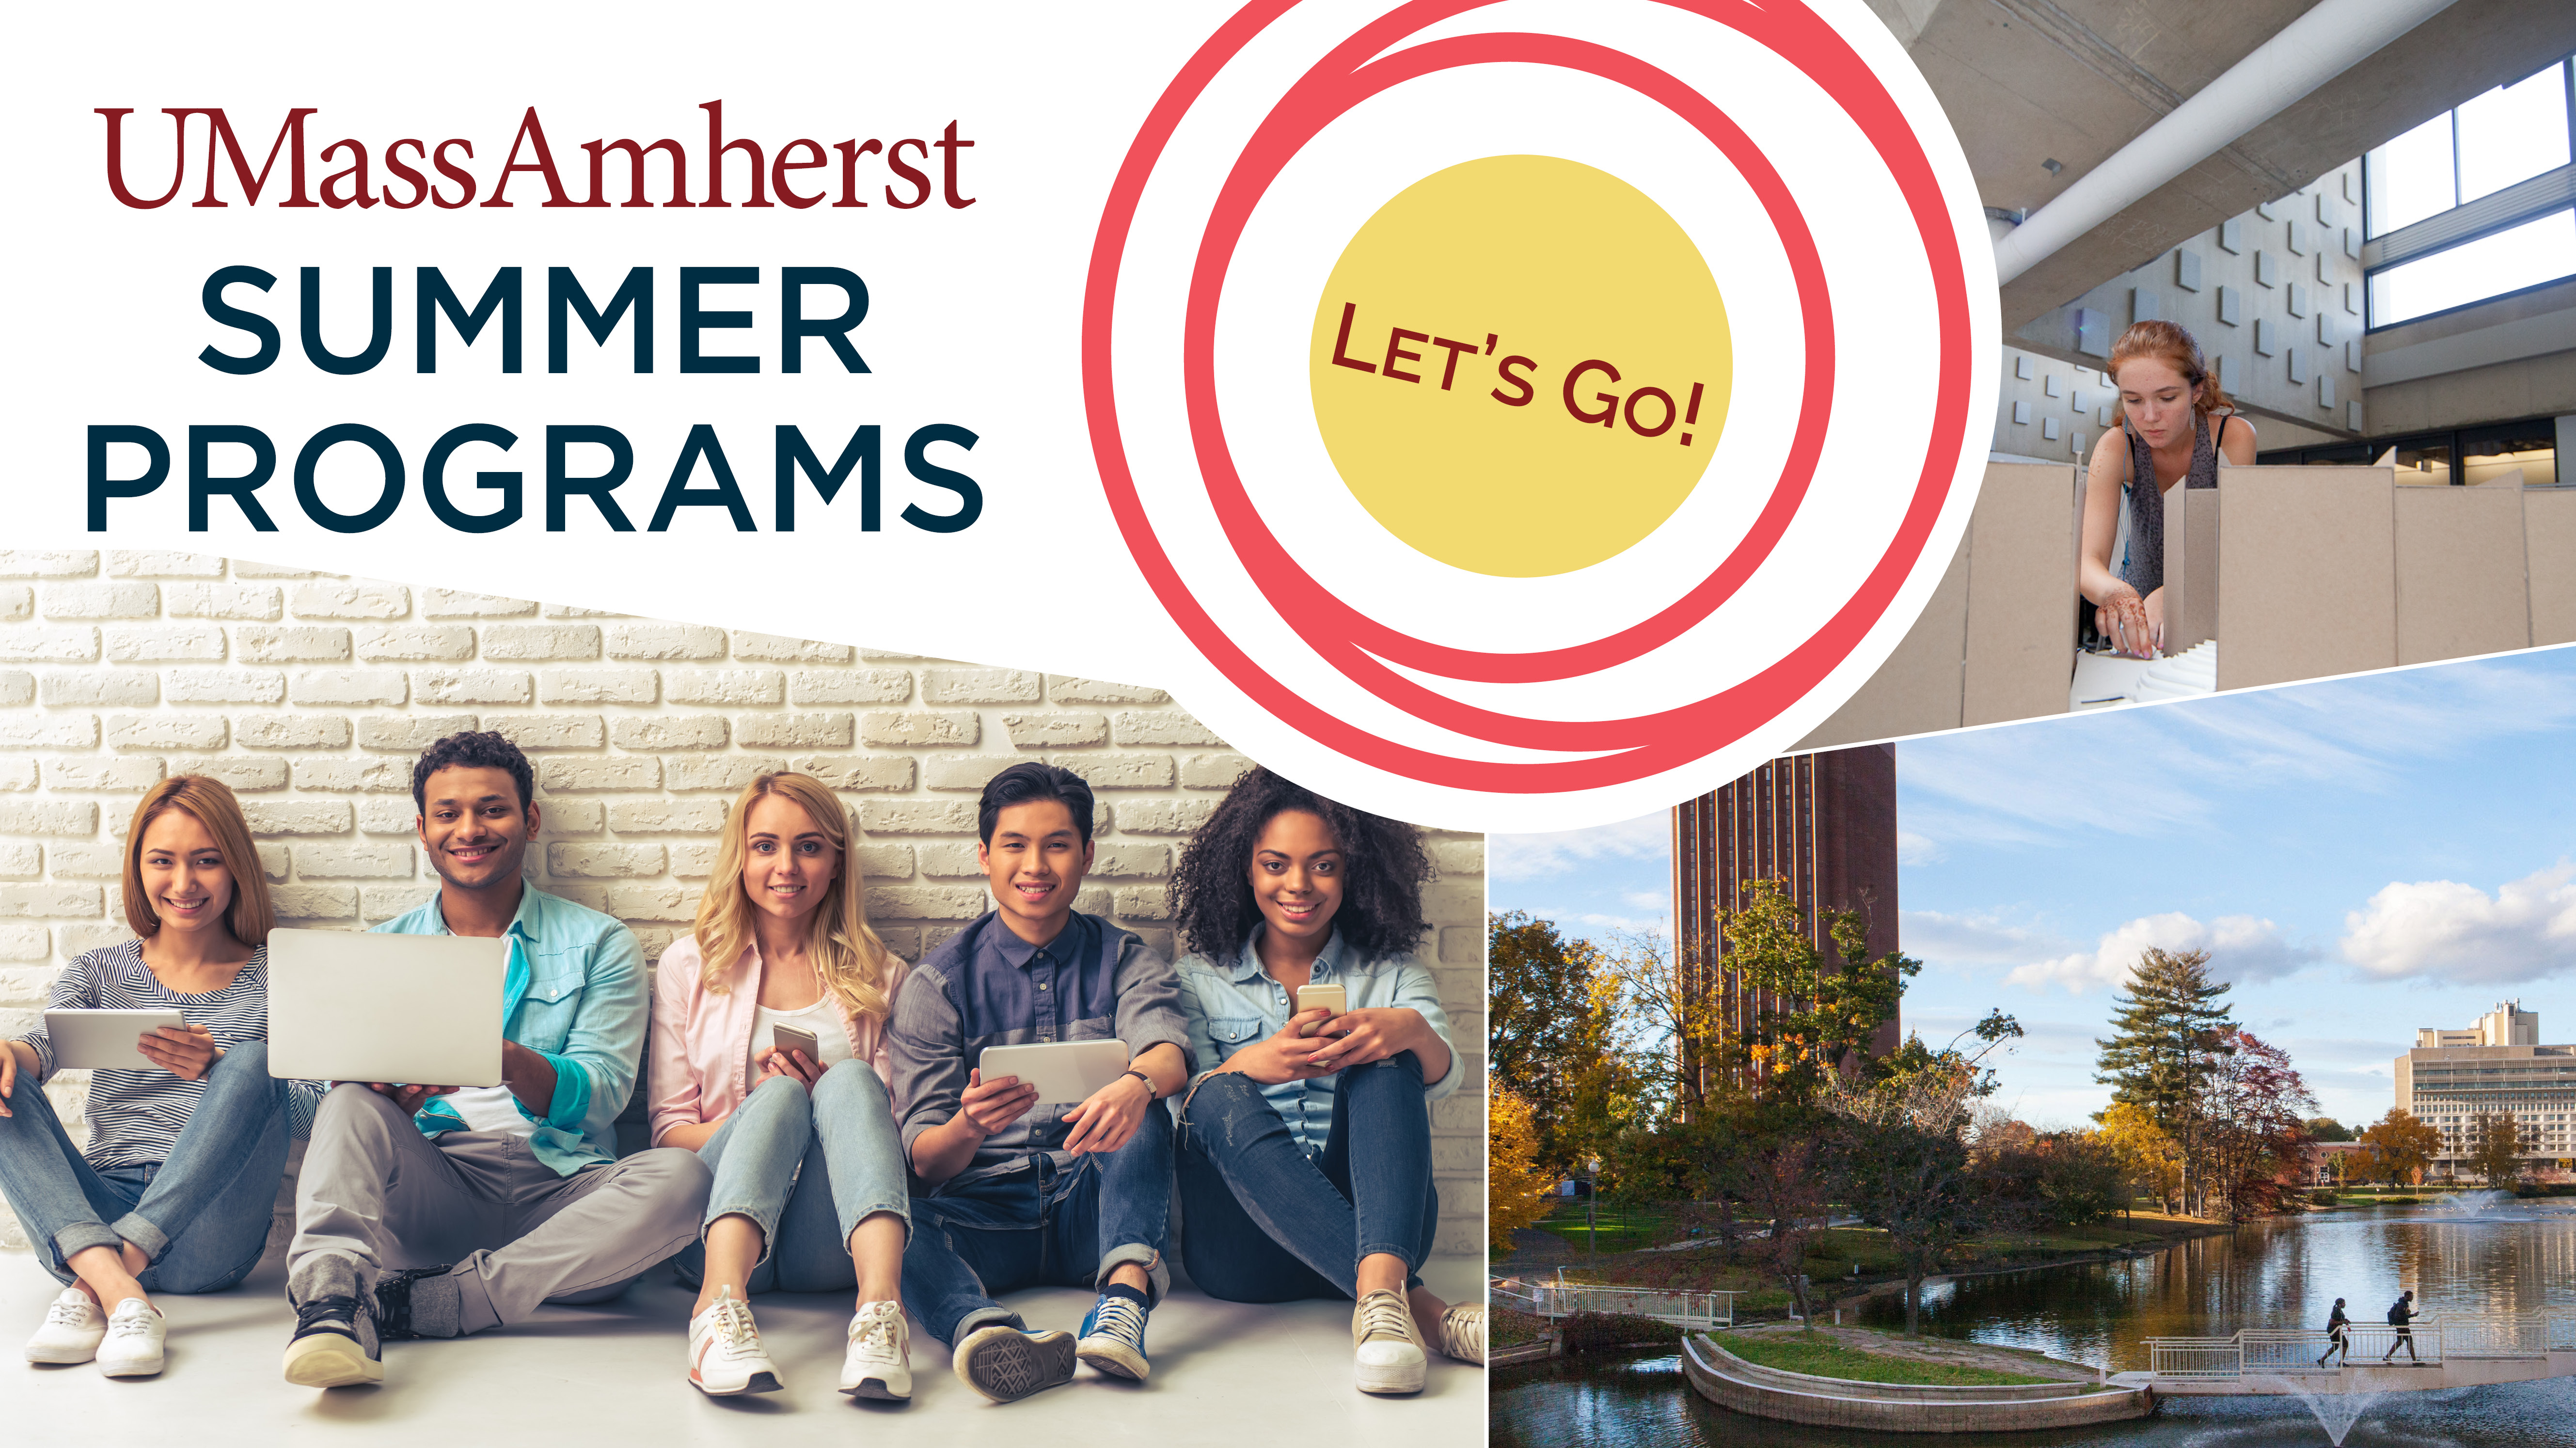 Summer Program - College Credit | Summer Engineering Institute (SENGI) at UMass Amherst